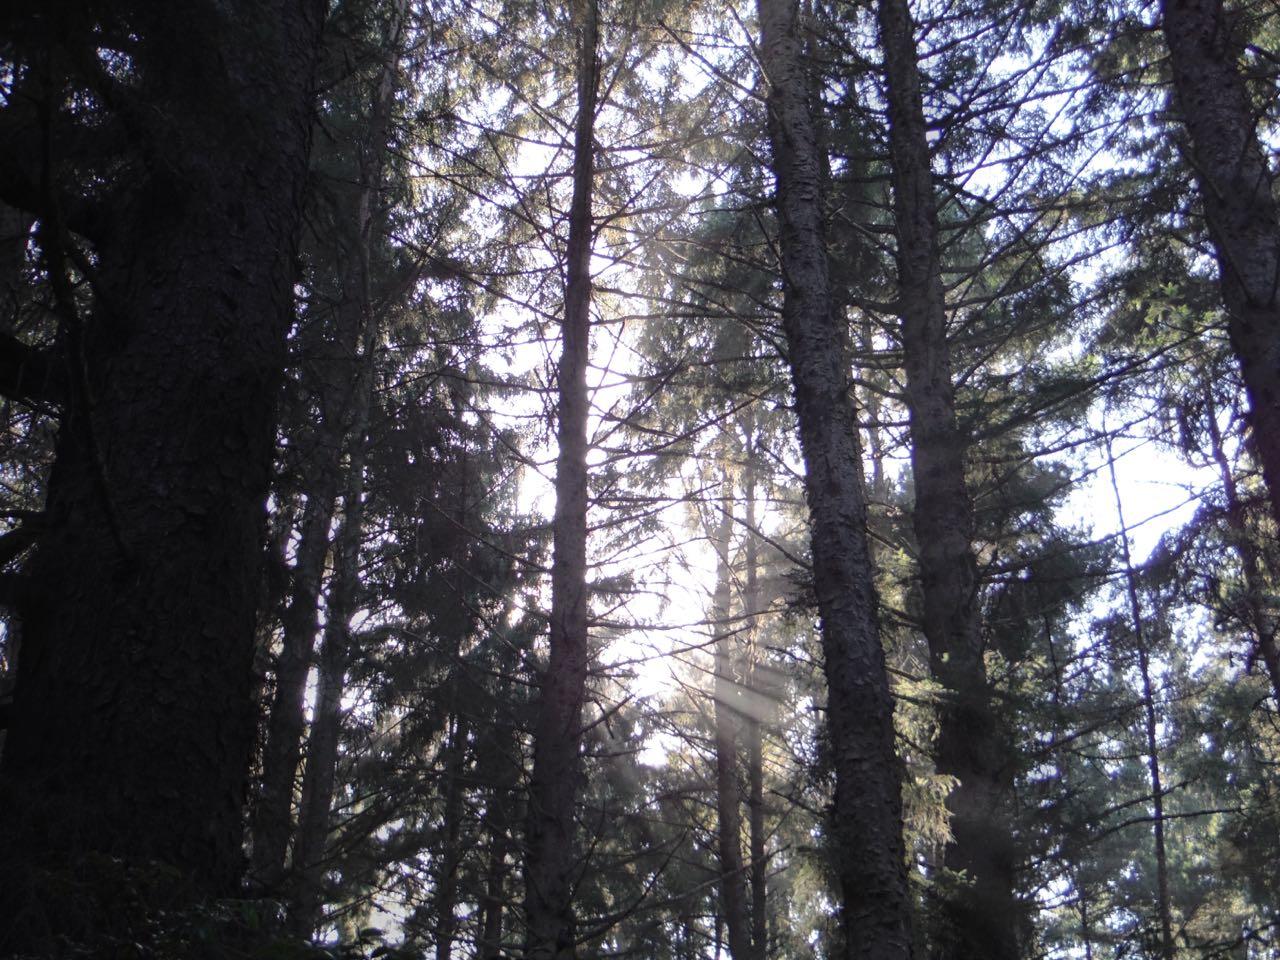 Redwoods 2017 10 08 165 Of 287